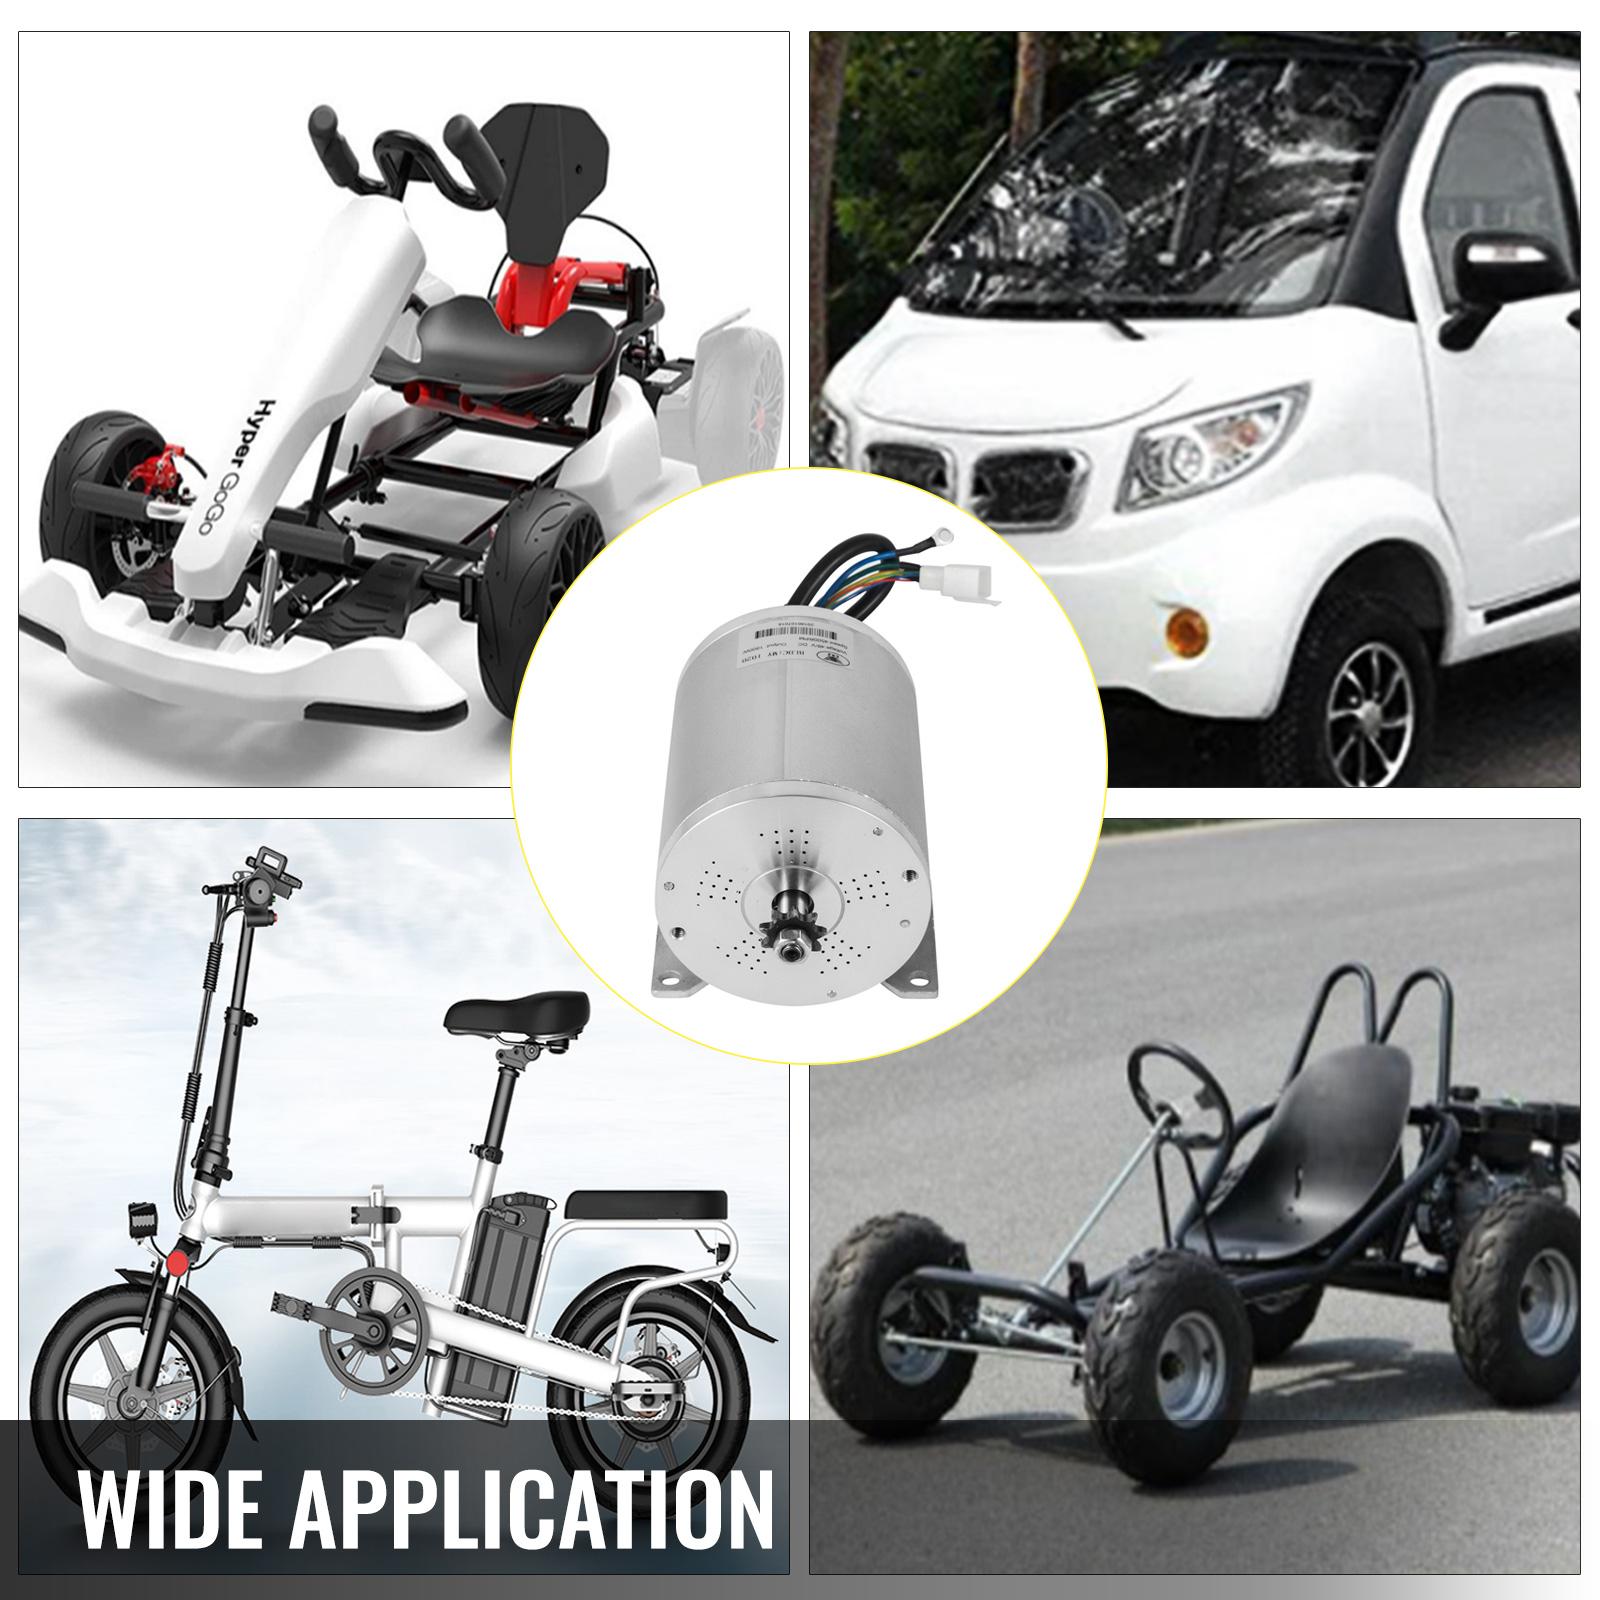 DC-electric-motor-12-60V-150W-2KW-for-scooter-bike-go-kart-minibike-e-ATV thumbnail 163